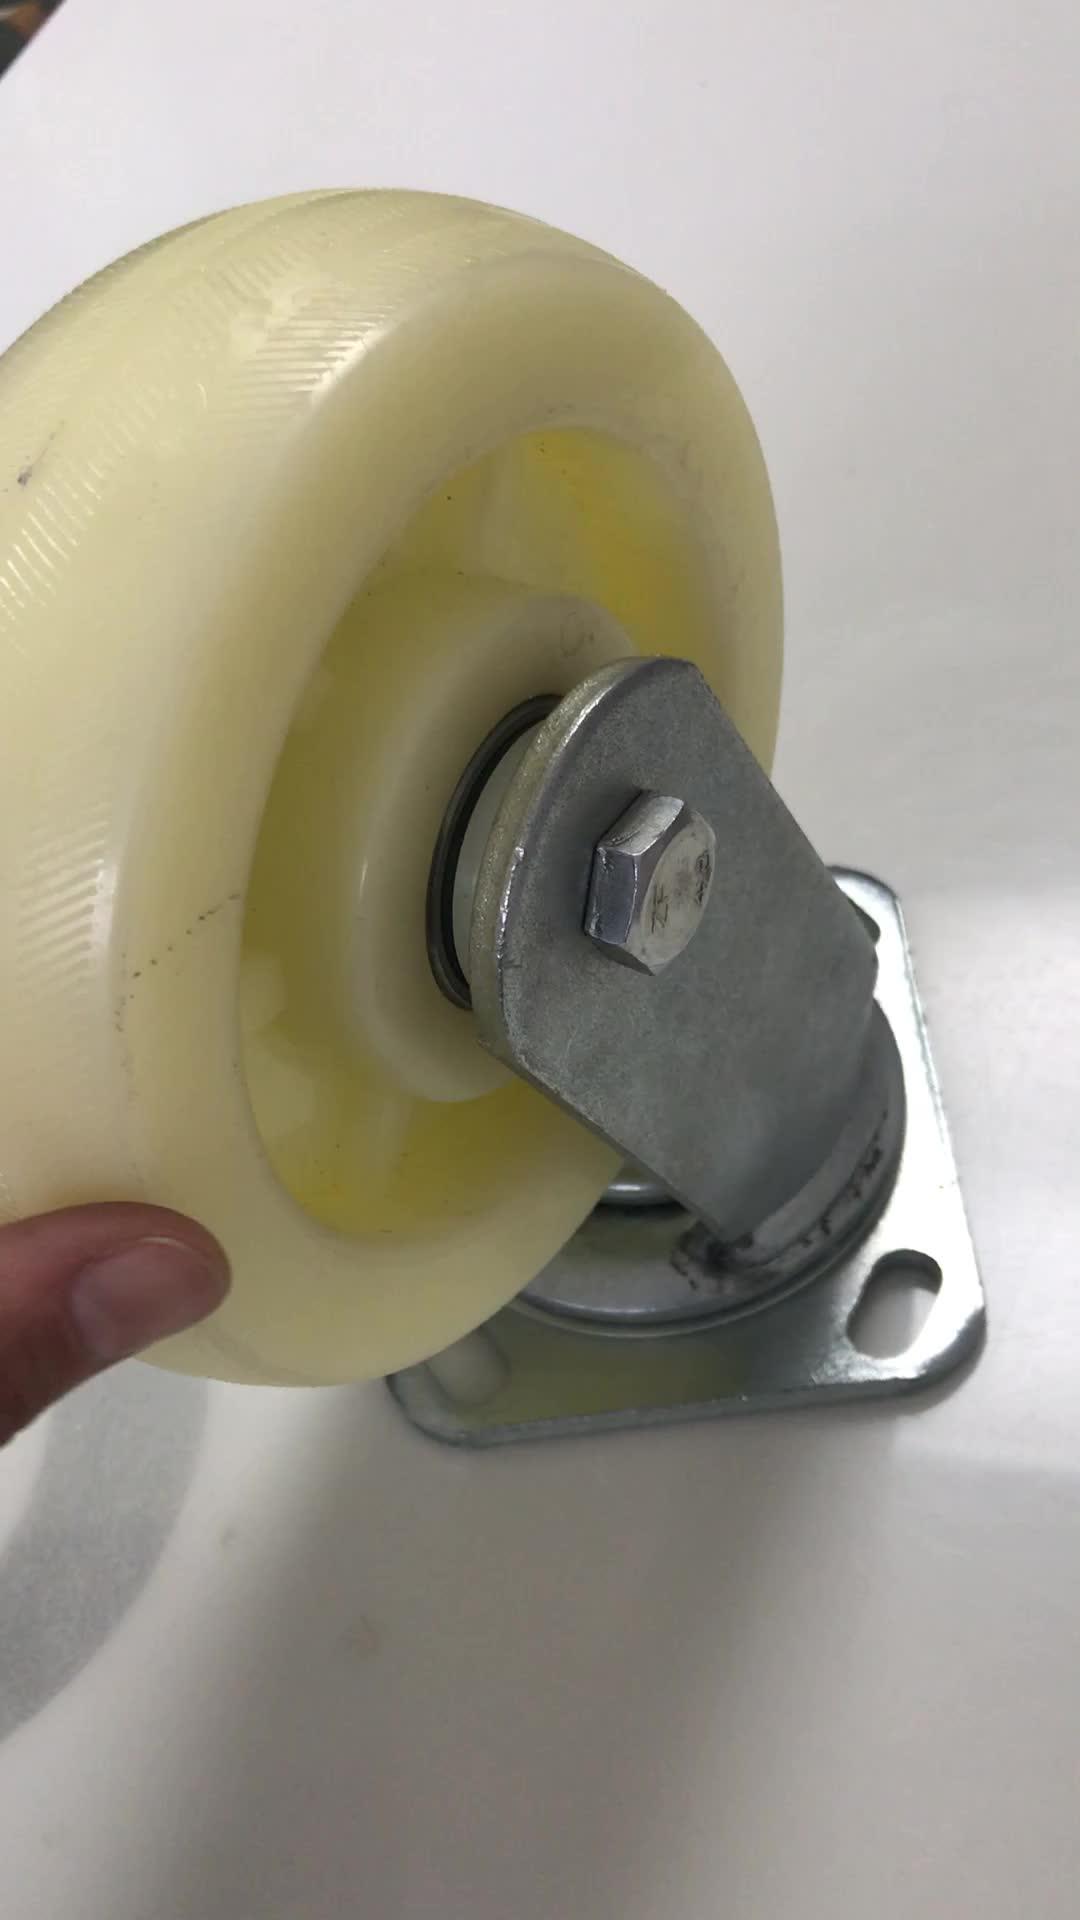 High quality 6 inch heavy duty nylon castor wheel for sale